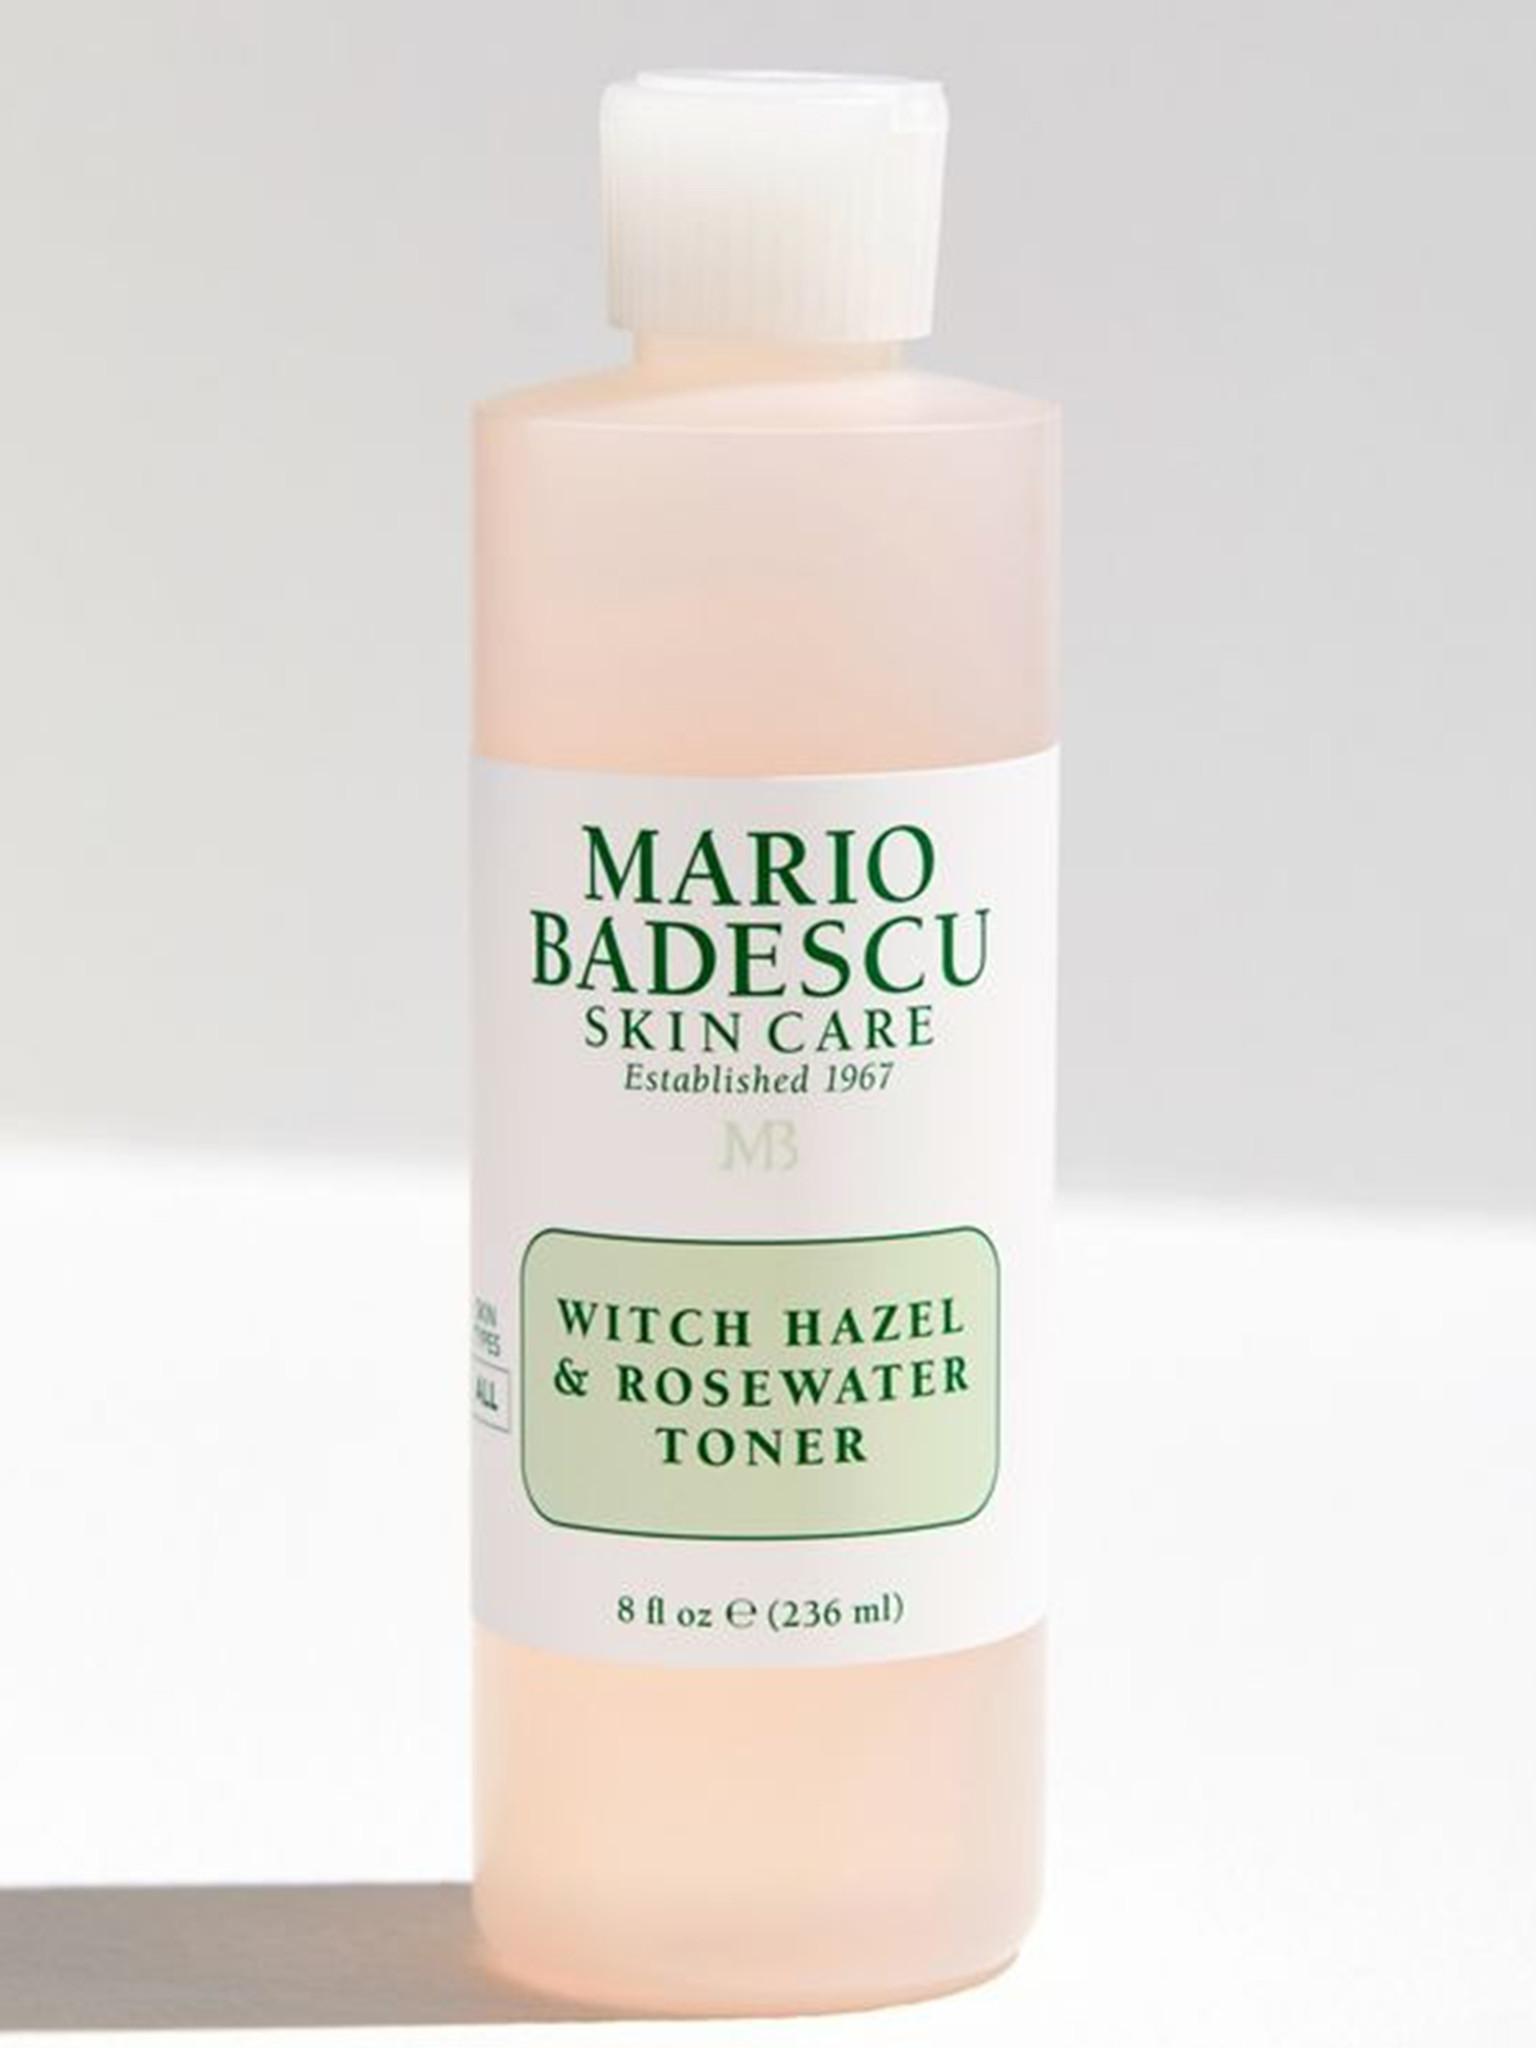 Witch Hazel & Rosewater Toner